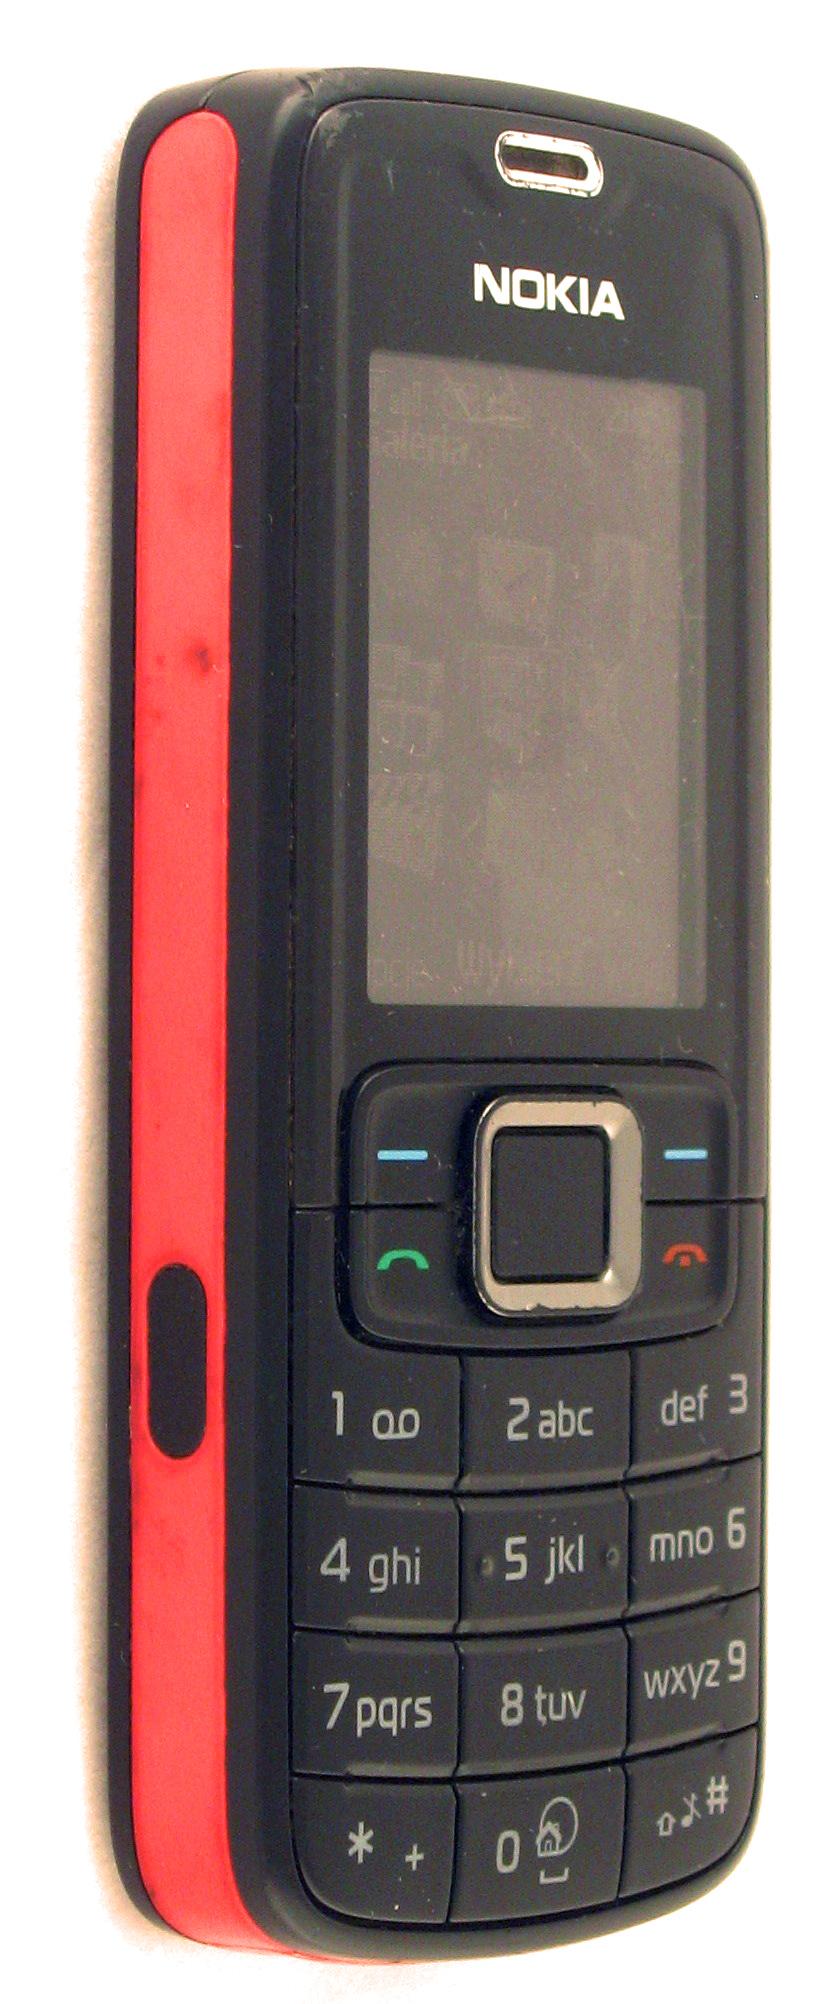 Nokia 3110c Driver Download